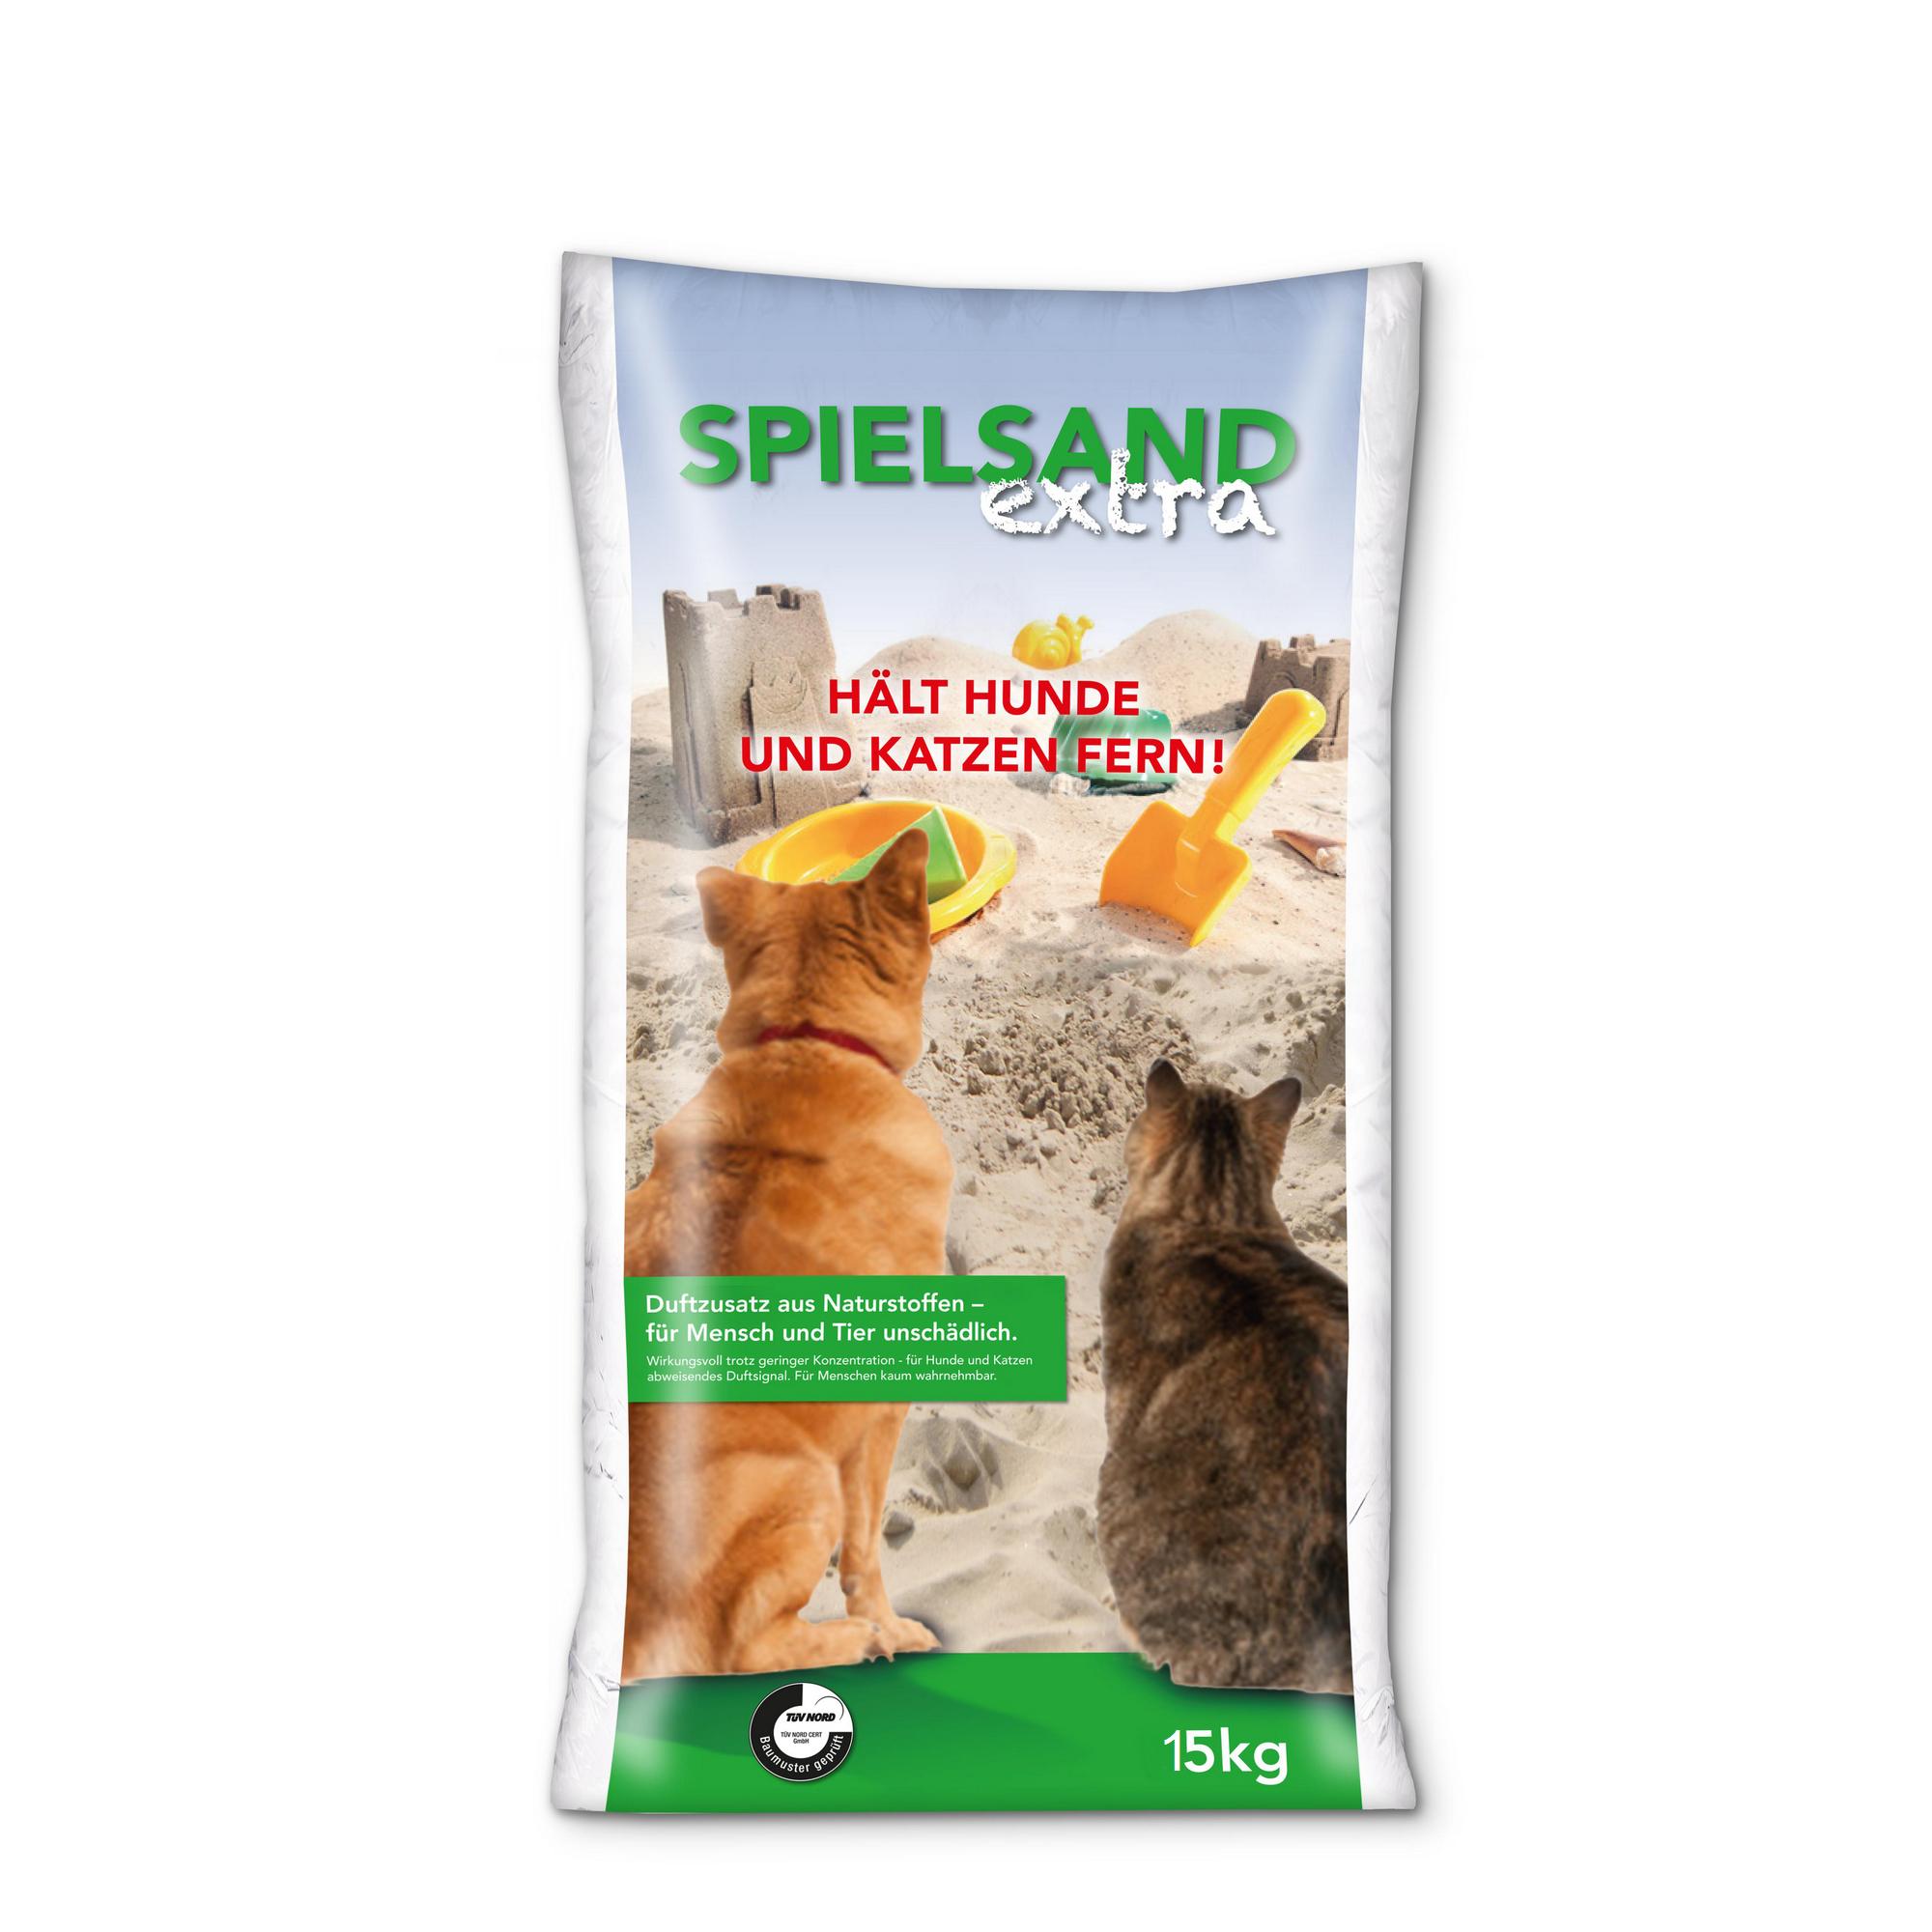 Spielsand Extra 15 kg/Sack, Abverkauf - [Lokal] toom Kaiserslautern